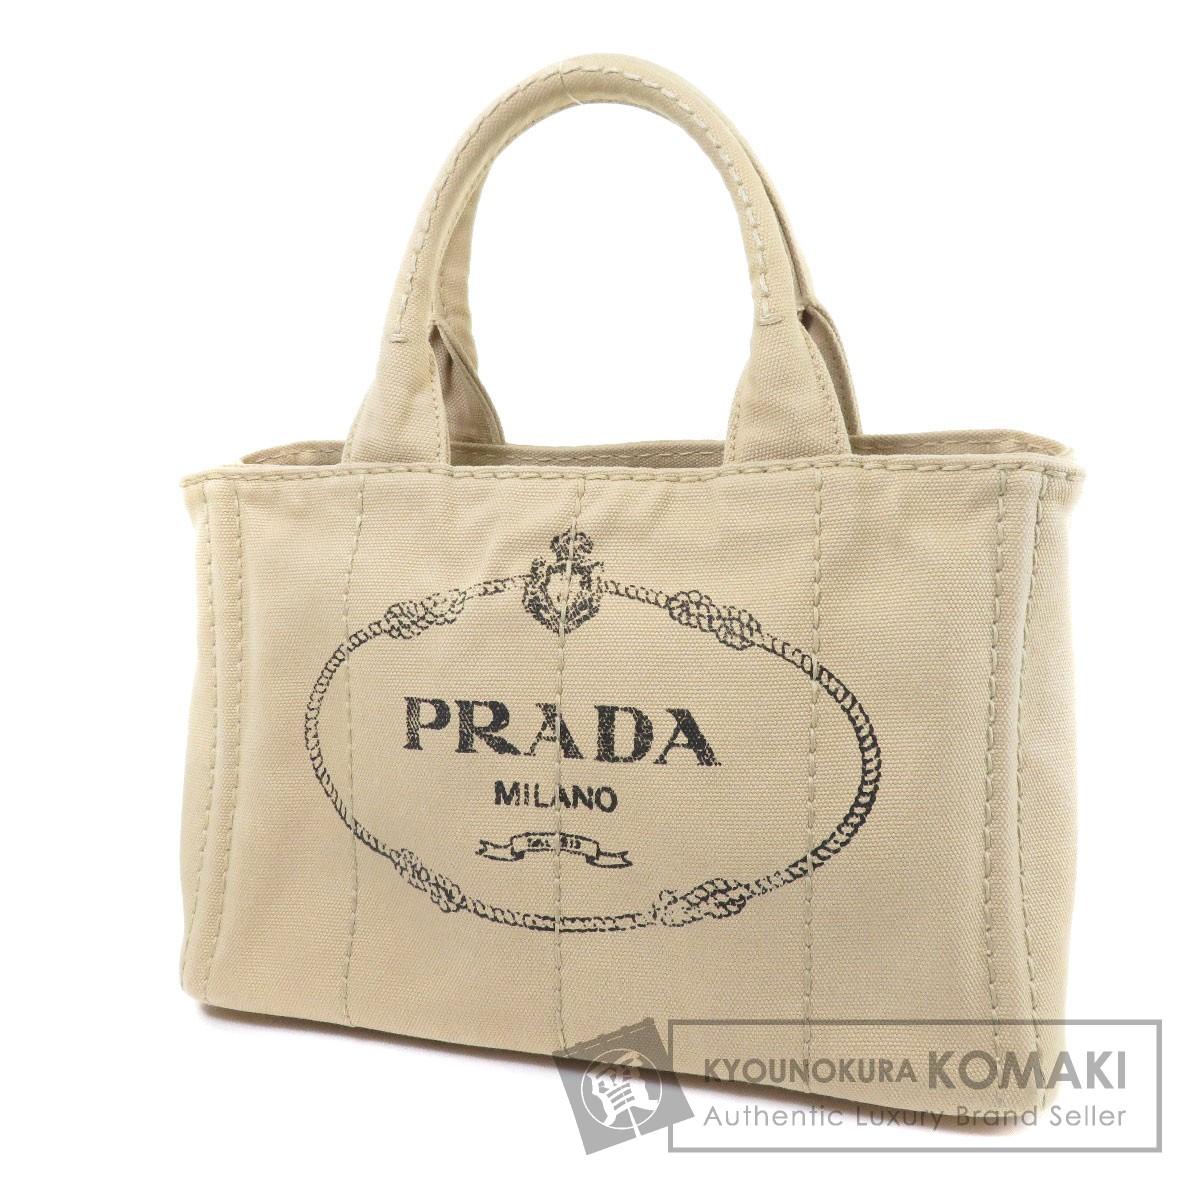 PRADA カナパ ミニ2WAY トートバッグ キャンバス レディース 【中古】【プラダ】